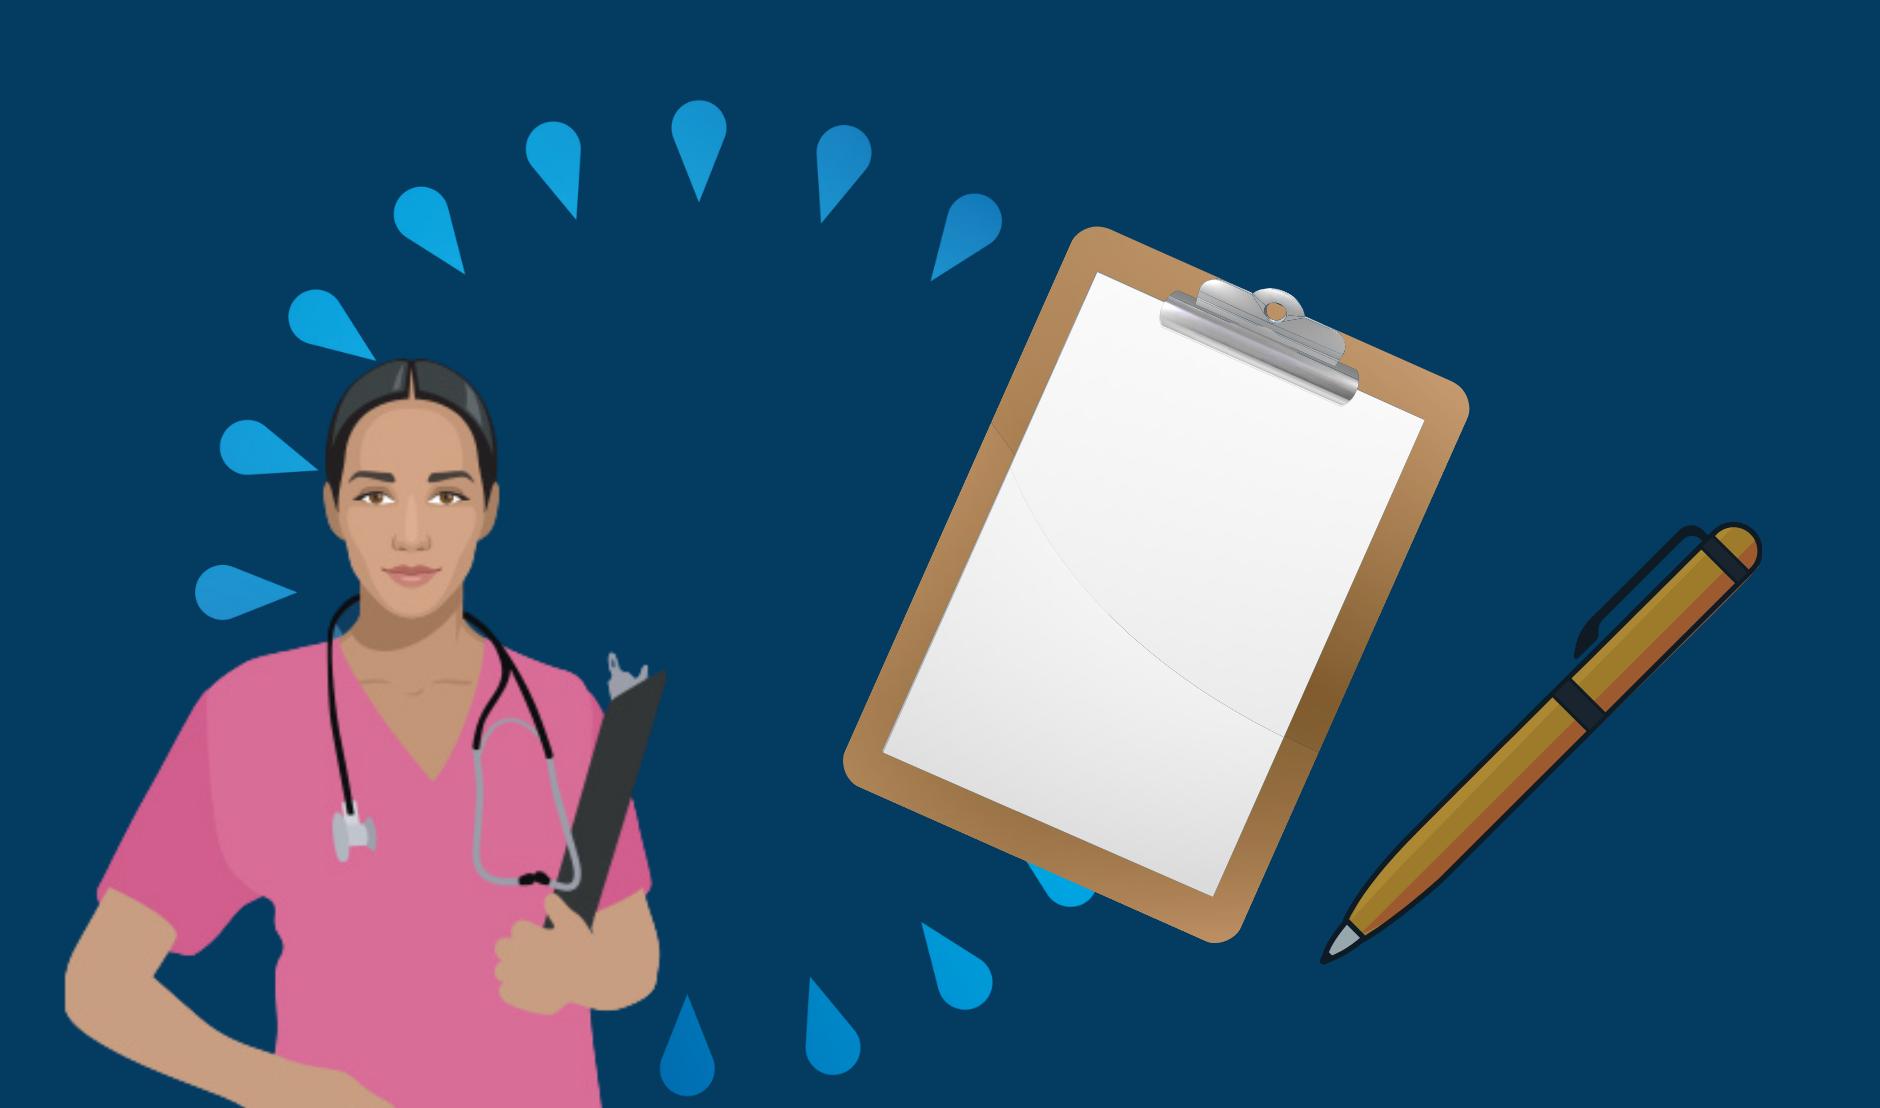 Female doctor - Salary